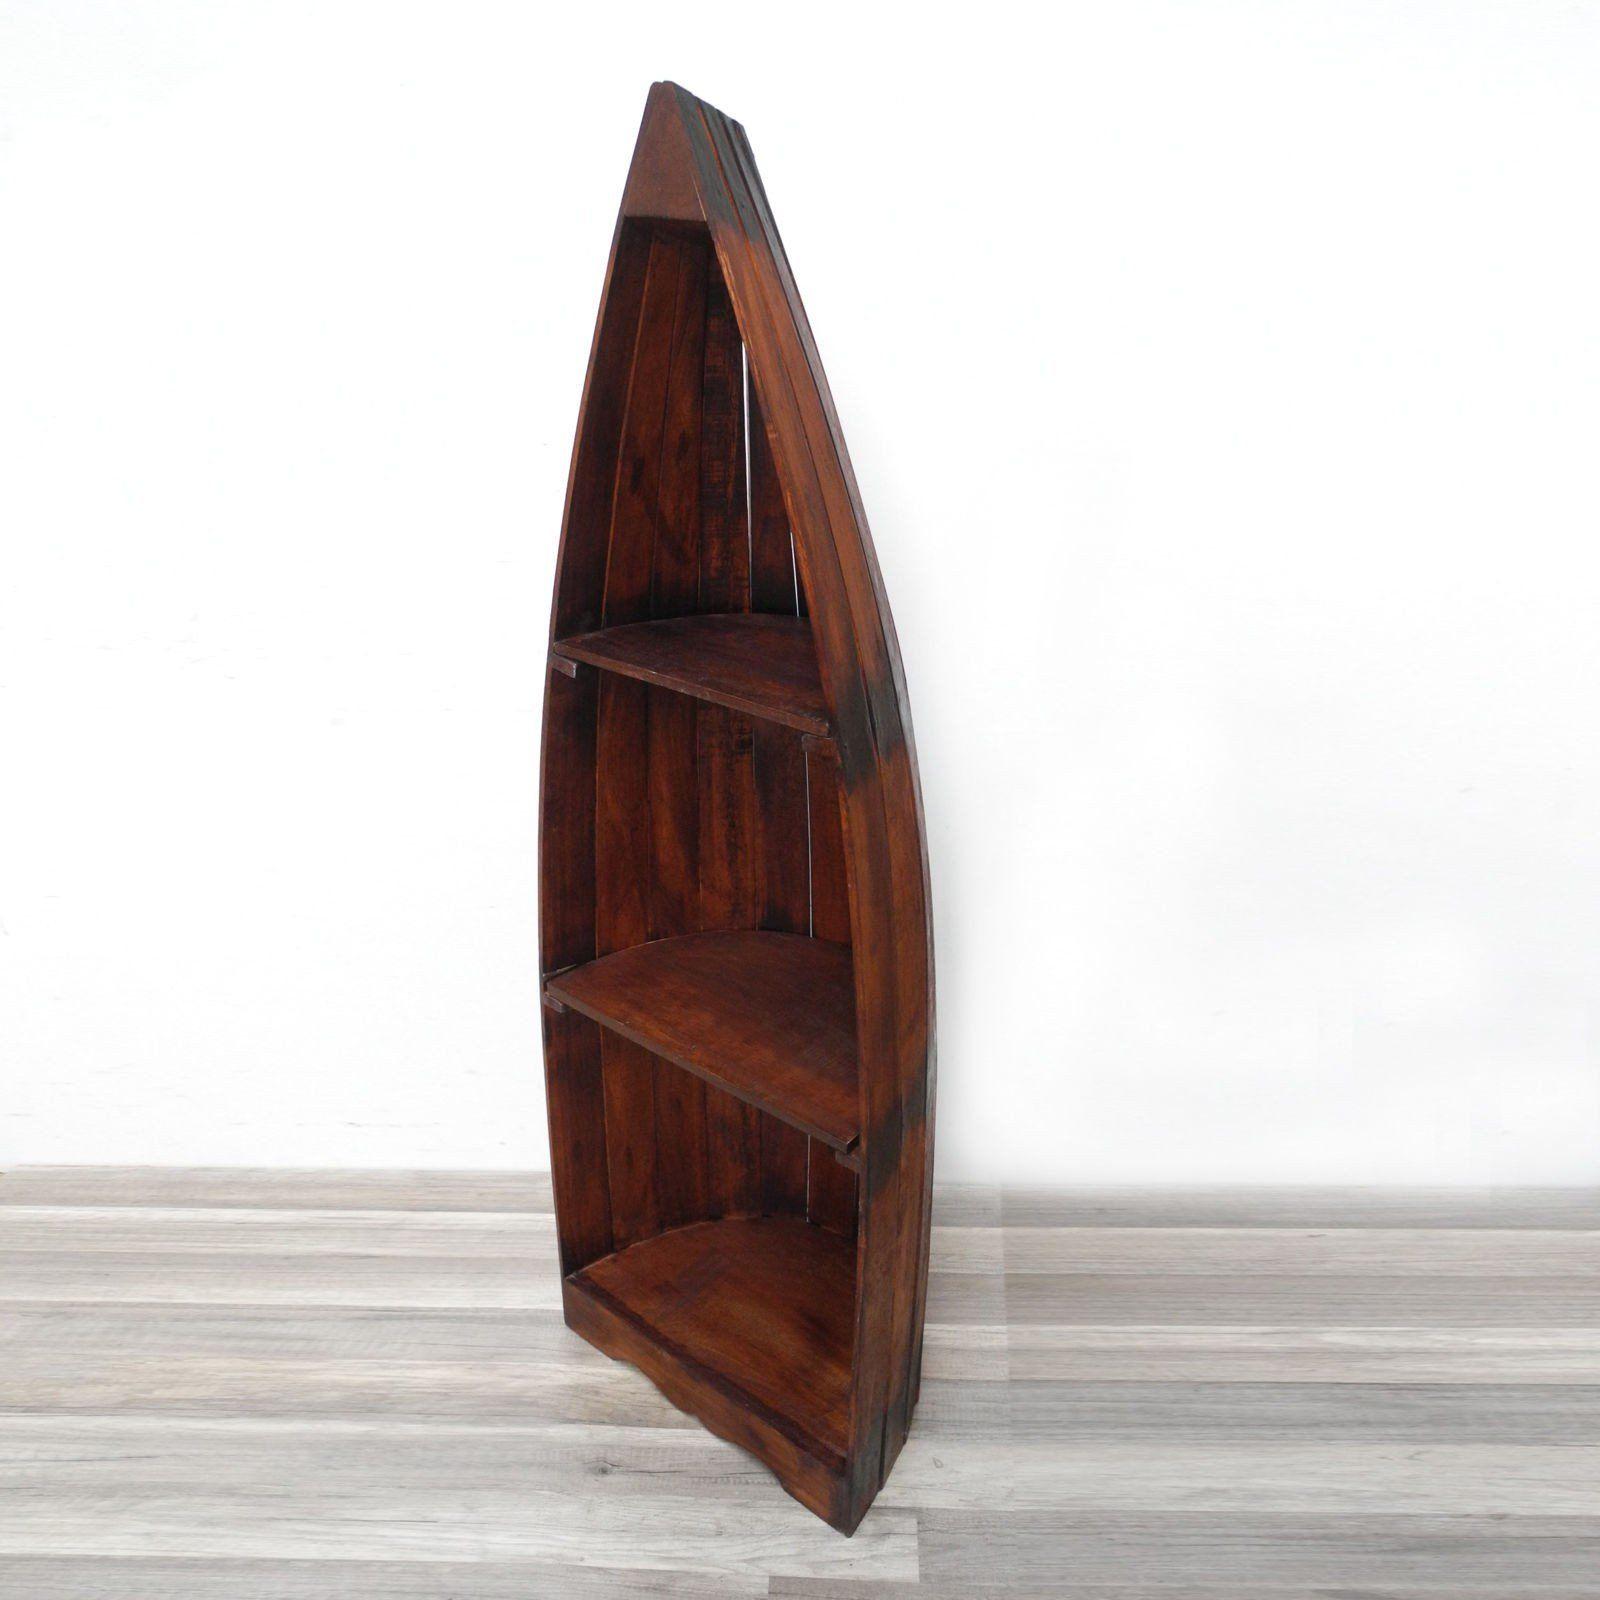 Asiatische Regale bootsregal bücherregal boot regal schiff schrank 145cm asien